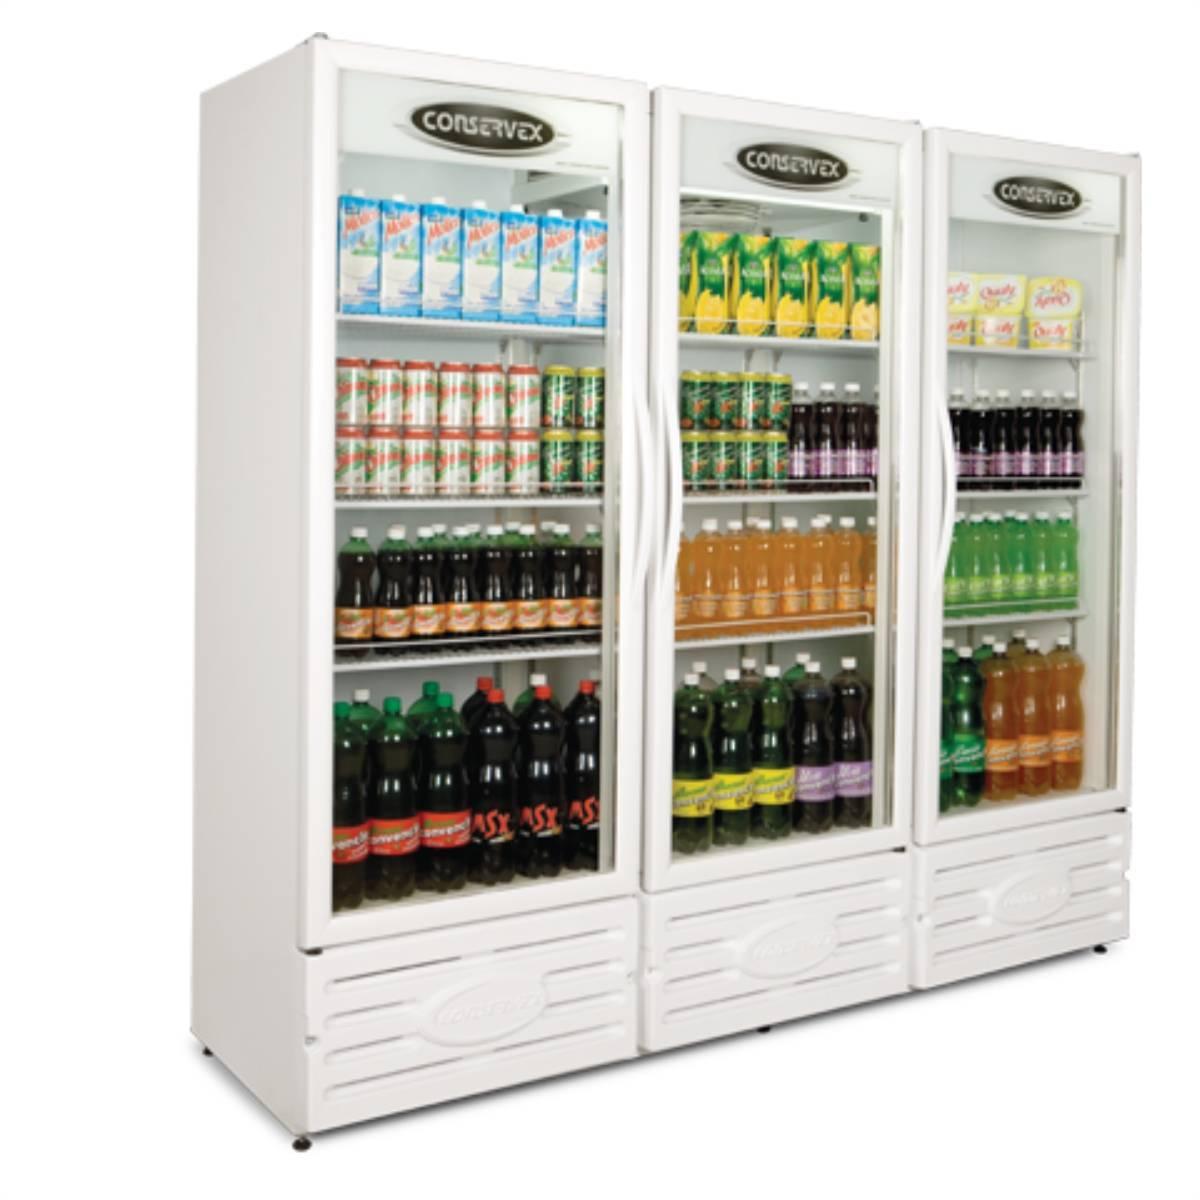 Expositor Refrigerado Vertical Visa Cooler 1300L Conservex